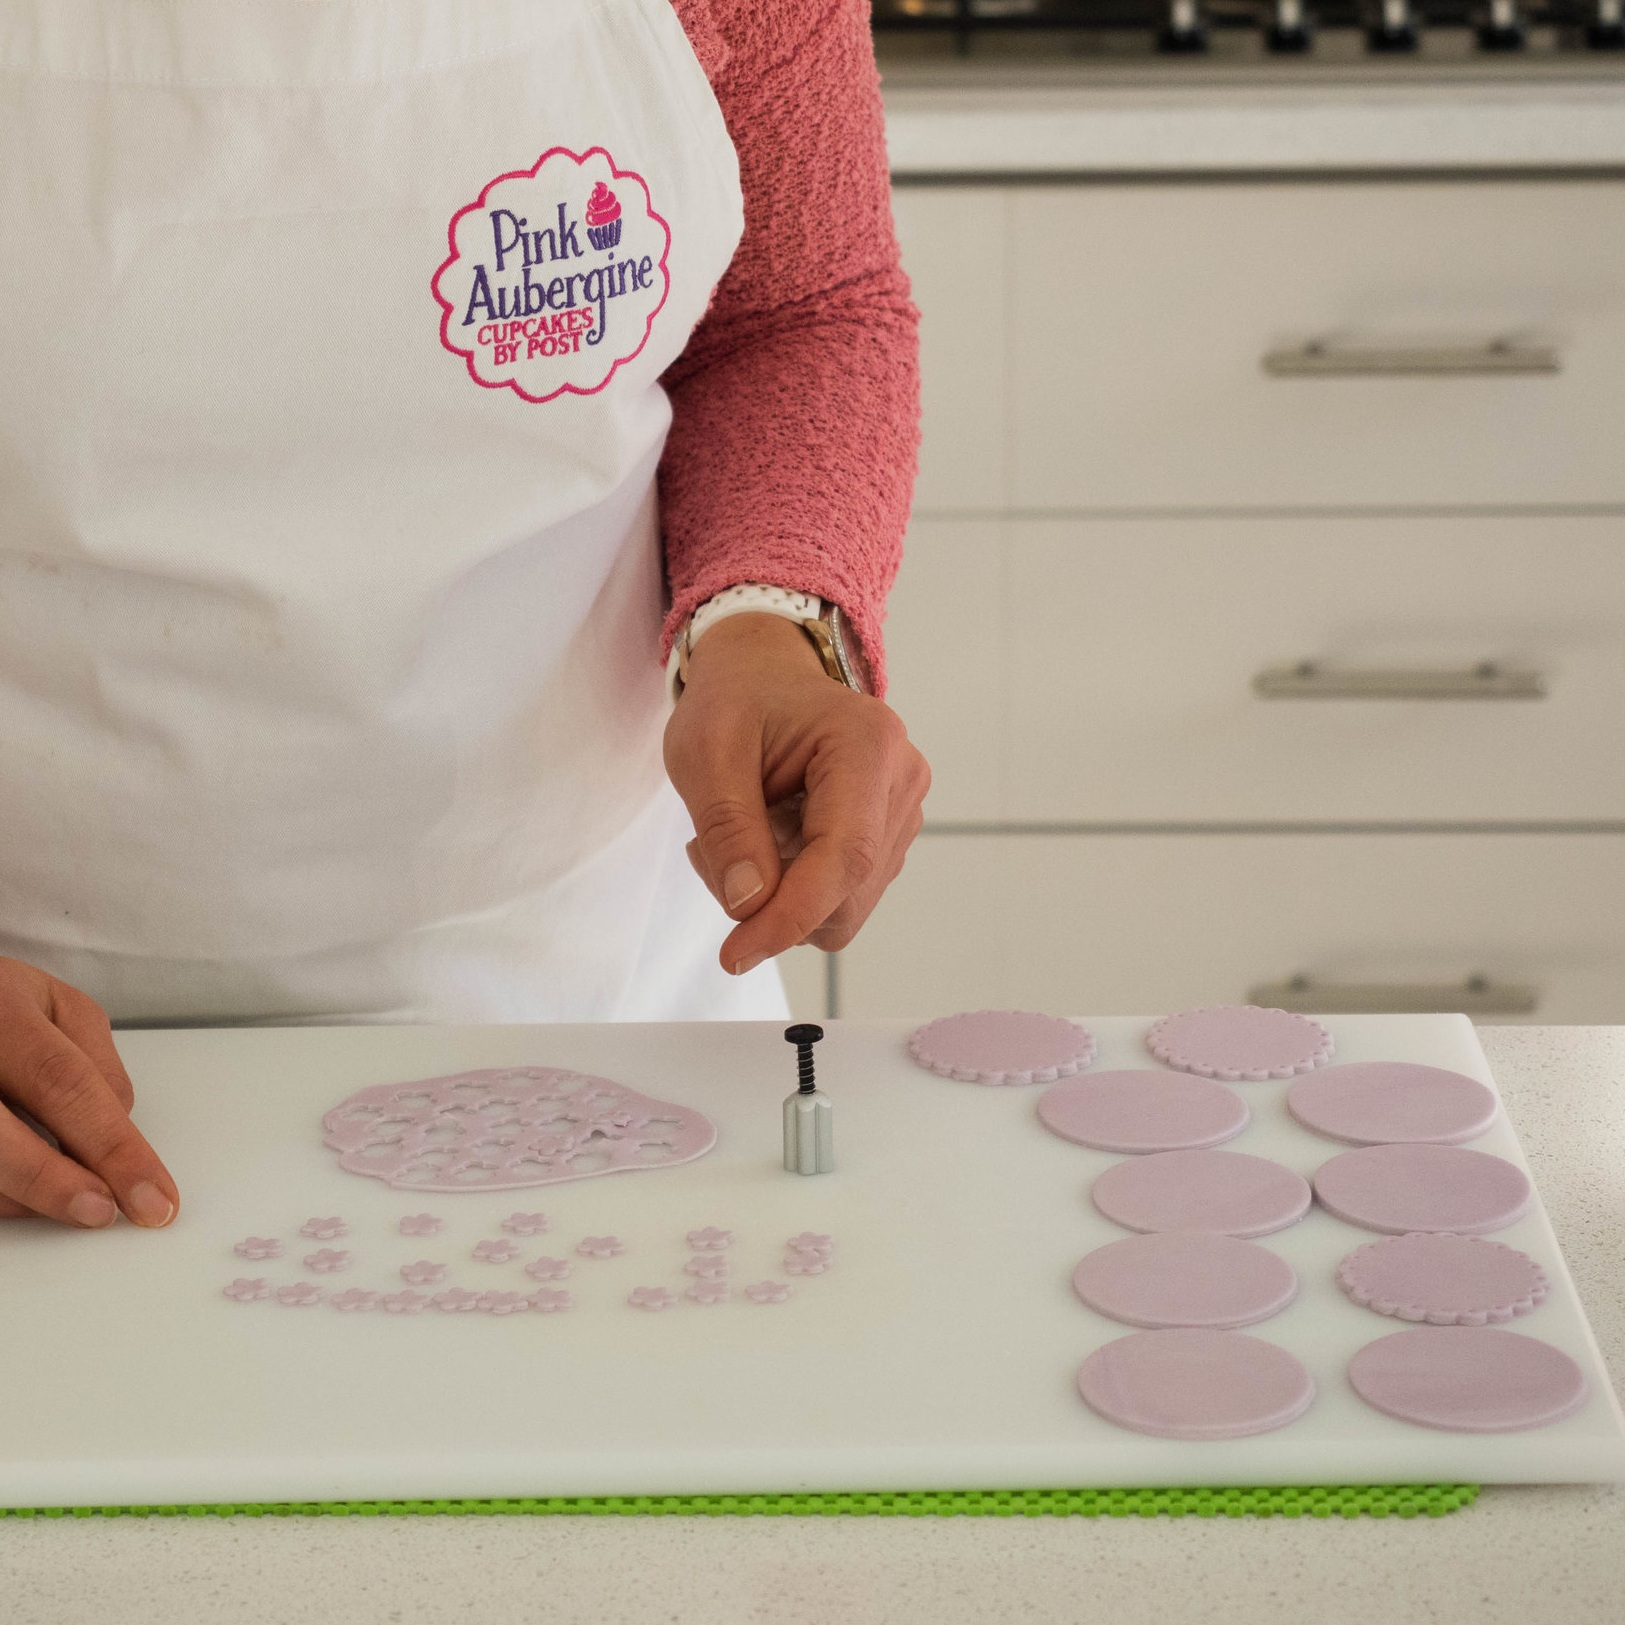 Personalised Cupcakes By Post | Handmade Cupcakes | Pink Aubergine Cupcakes